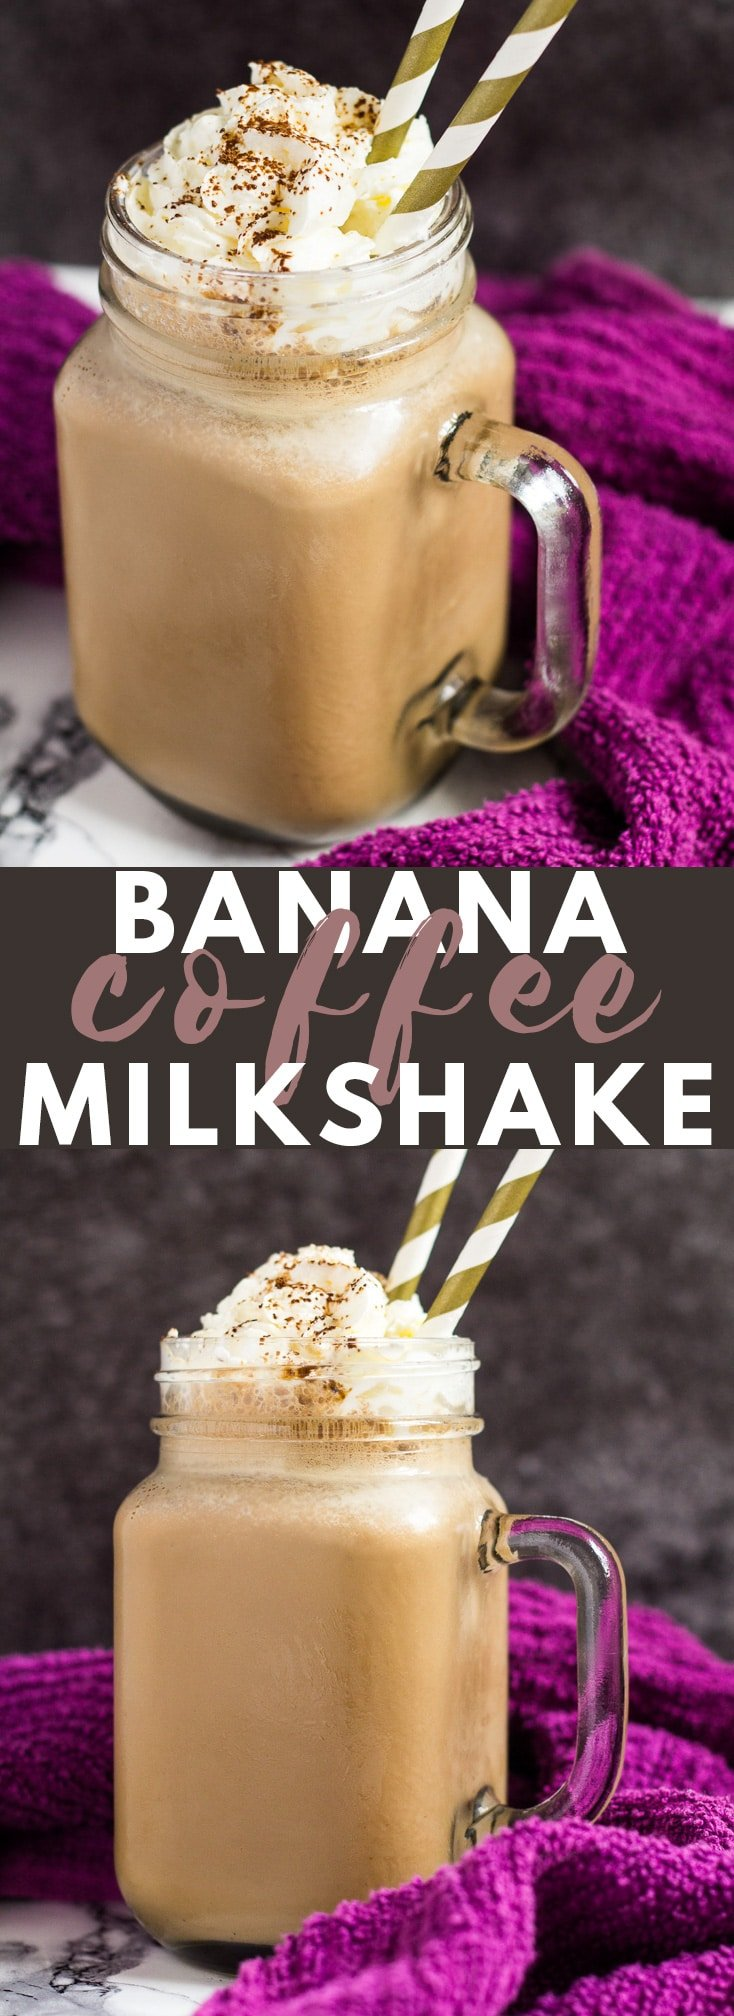 Banana Coffee Milkshake- Wonderfully creamy banana milkshake that is infused with coffee. An indulgent drink for coffee lovers! #banana #coffee #milkshake #recipe